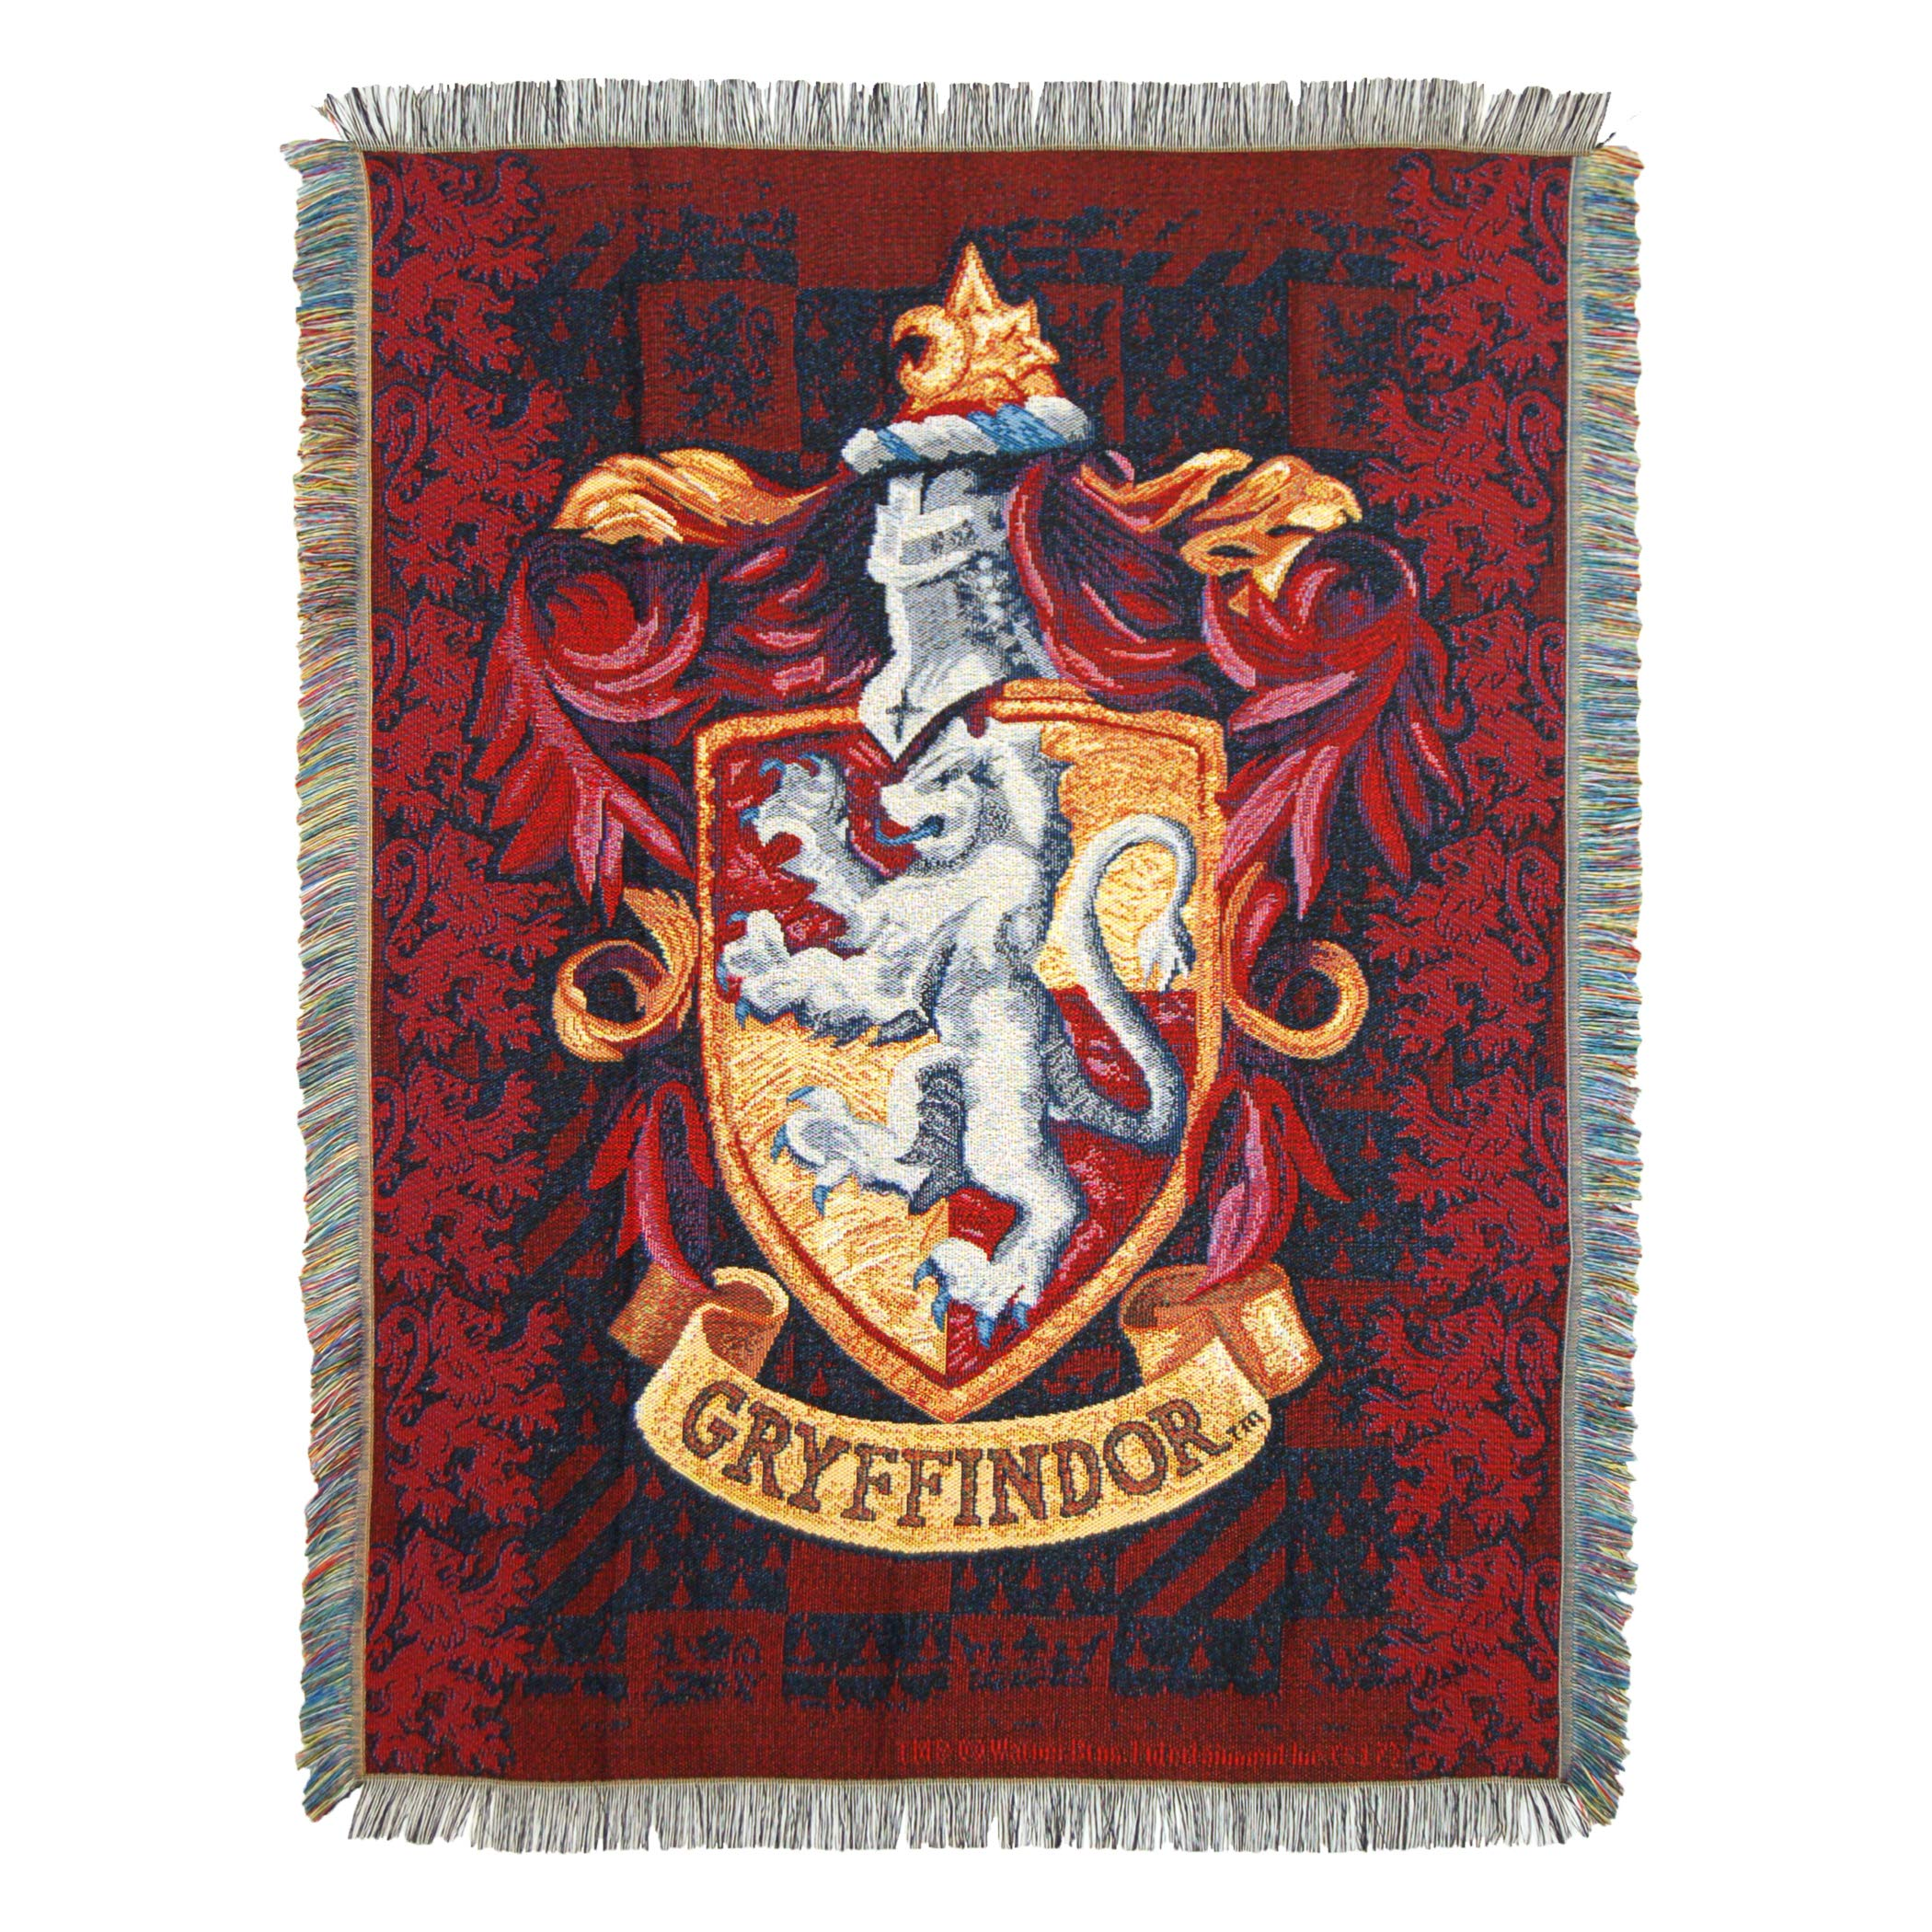 Harry Potter Woven Jacquard Throw Blanket